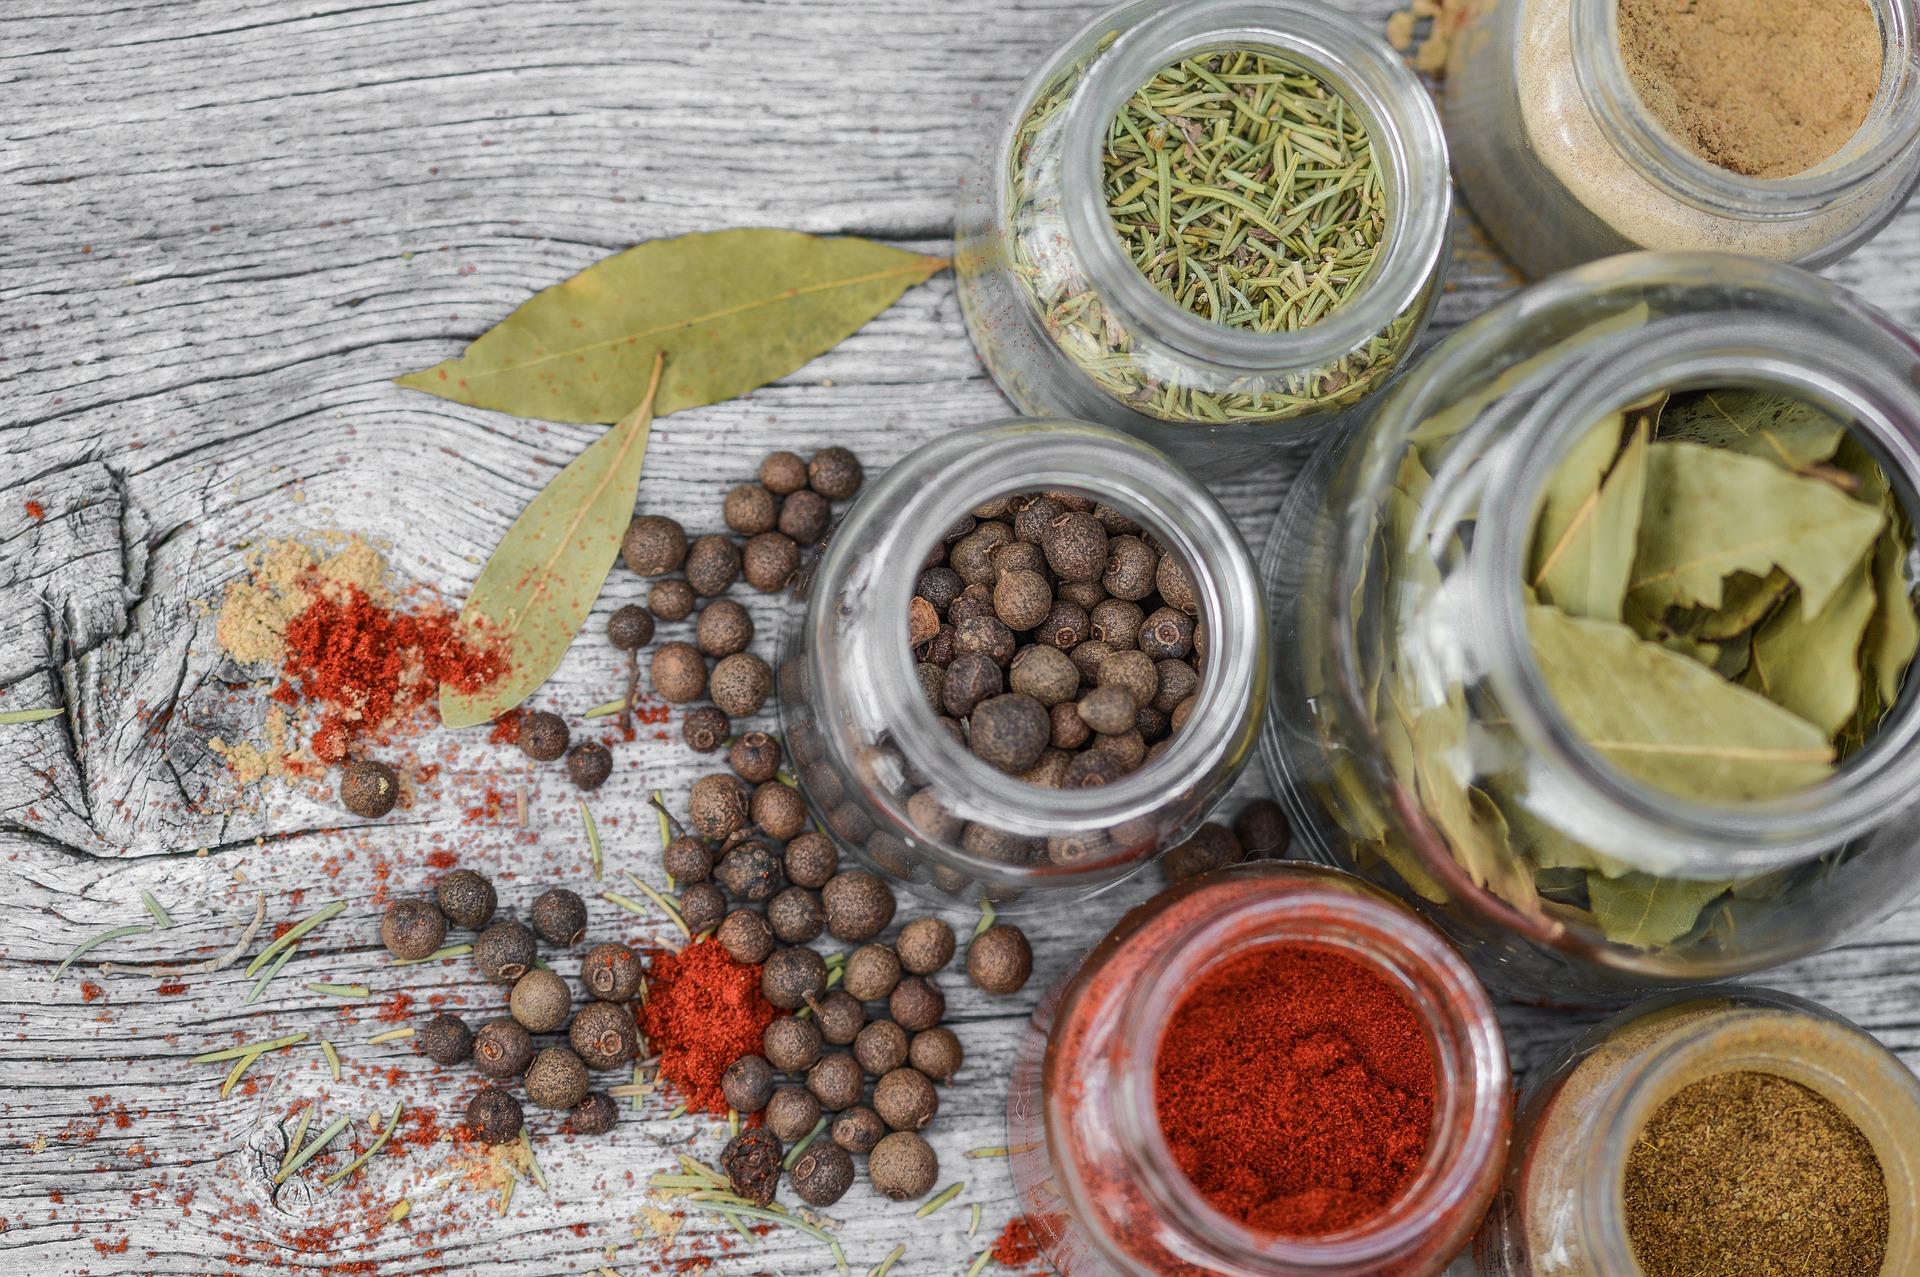 spices-2548653_1920.jpg